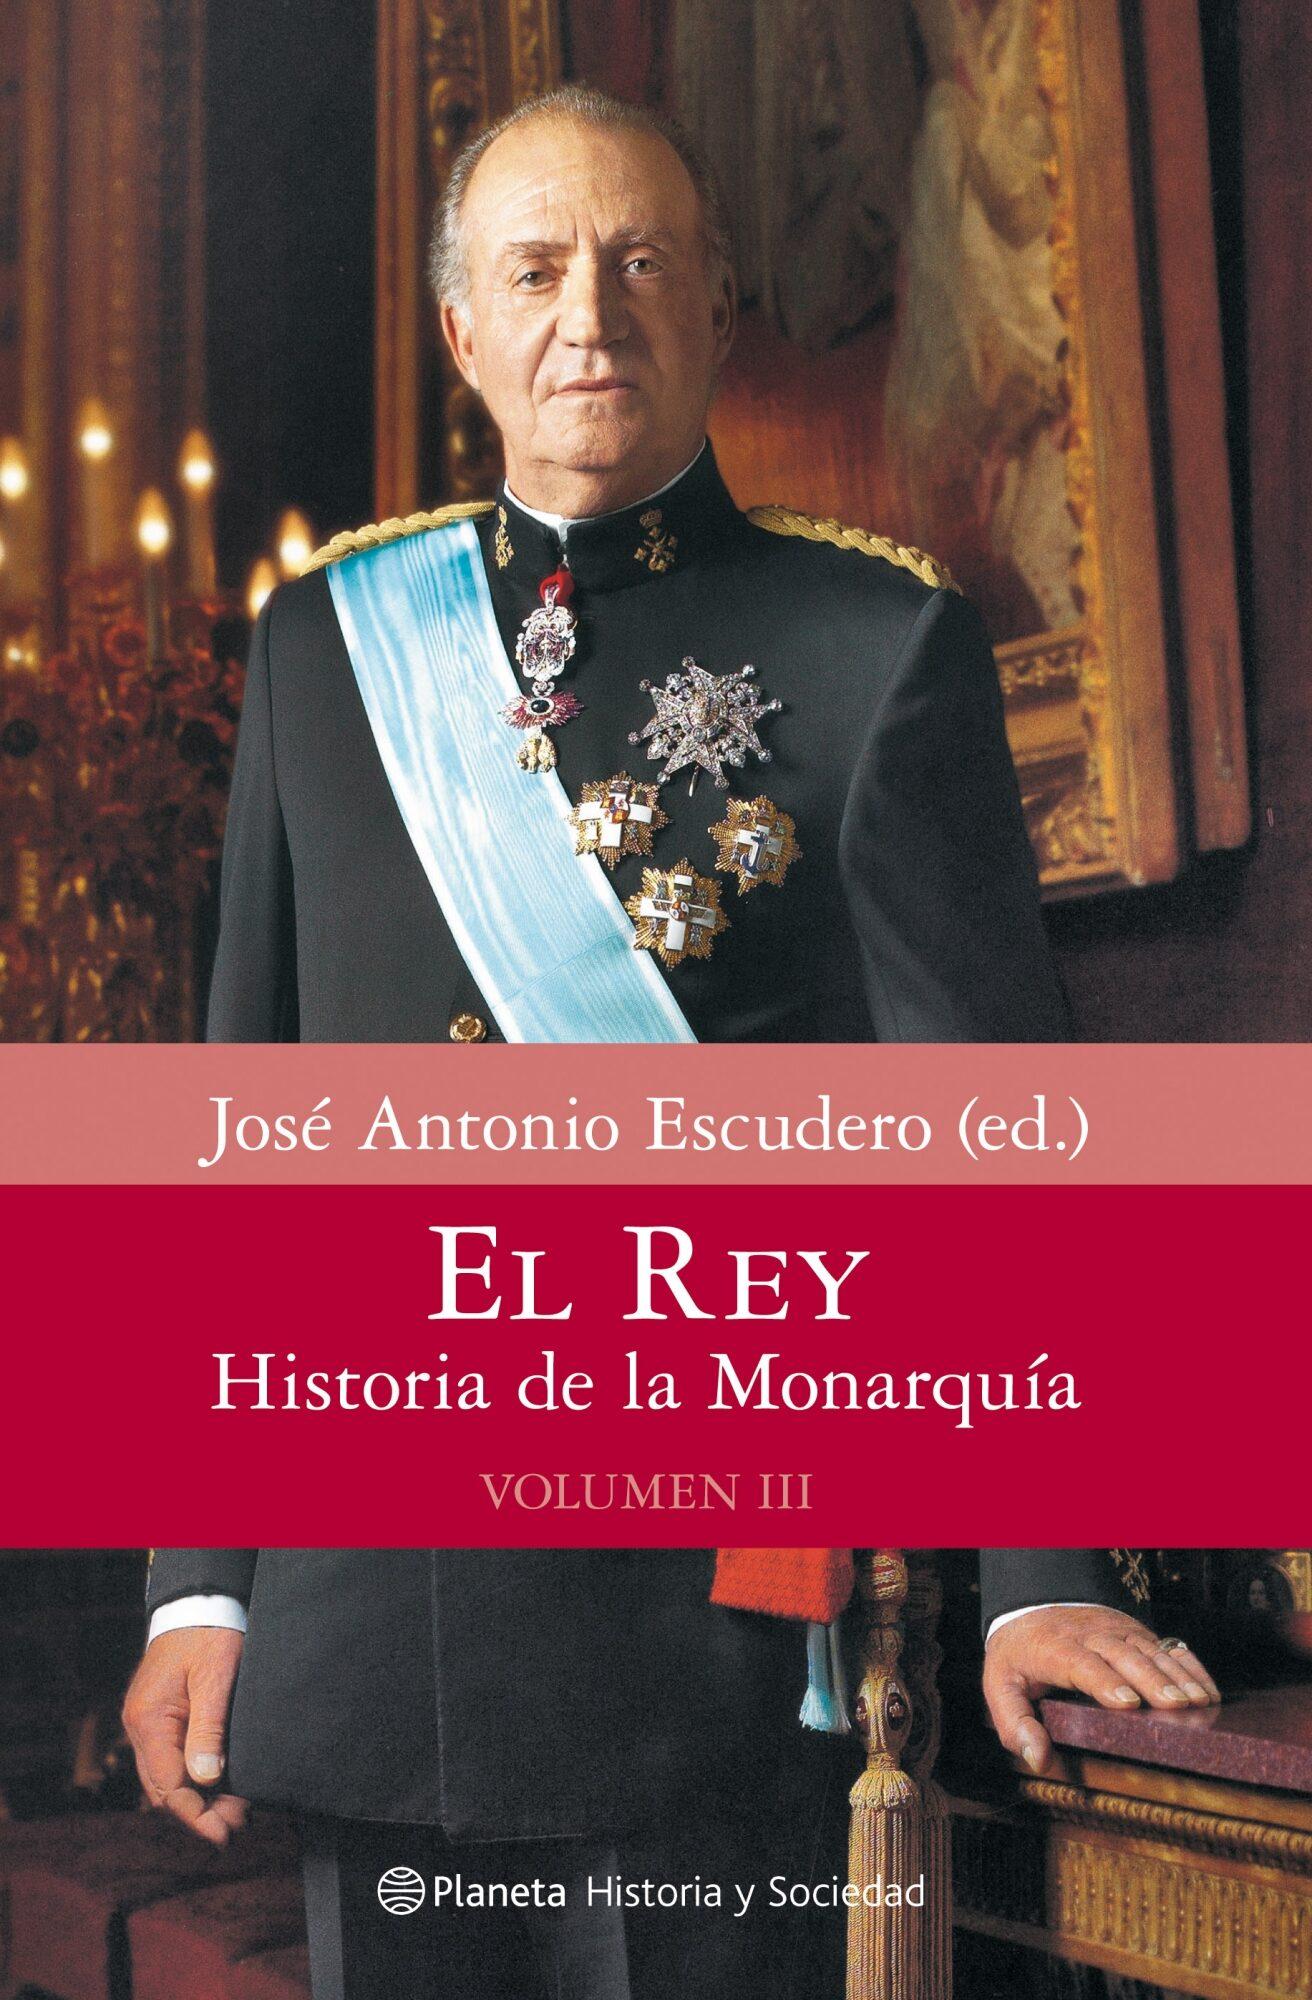 El Rey: Historia De La Monarquia. (vol.3) por Jose Antonio Escudero epub